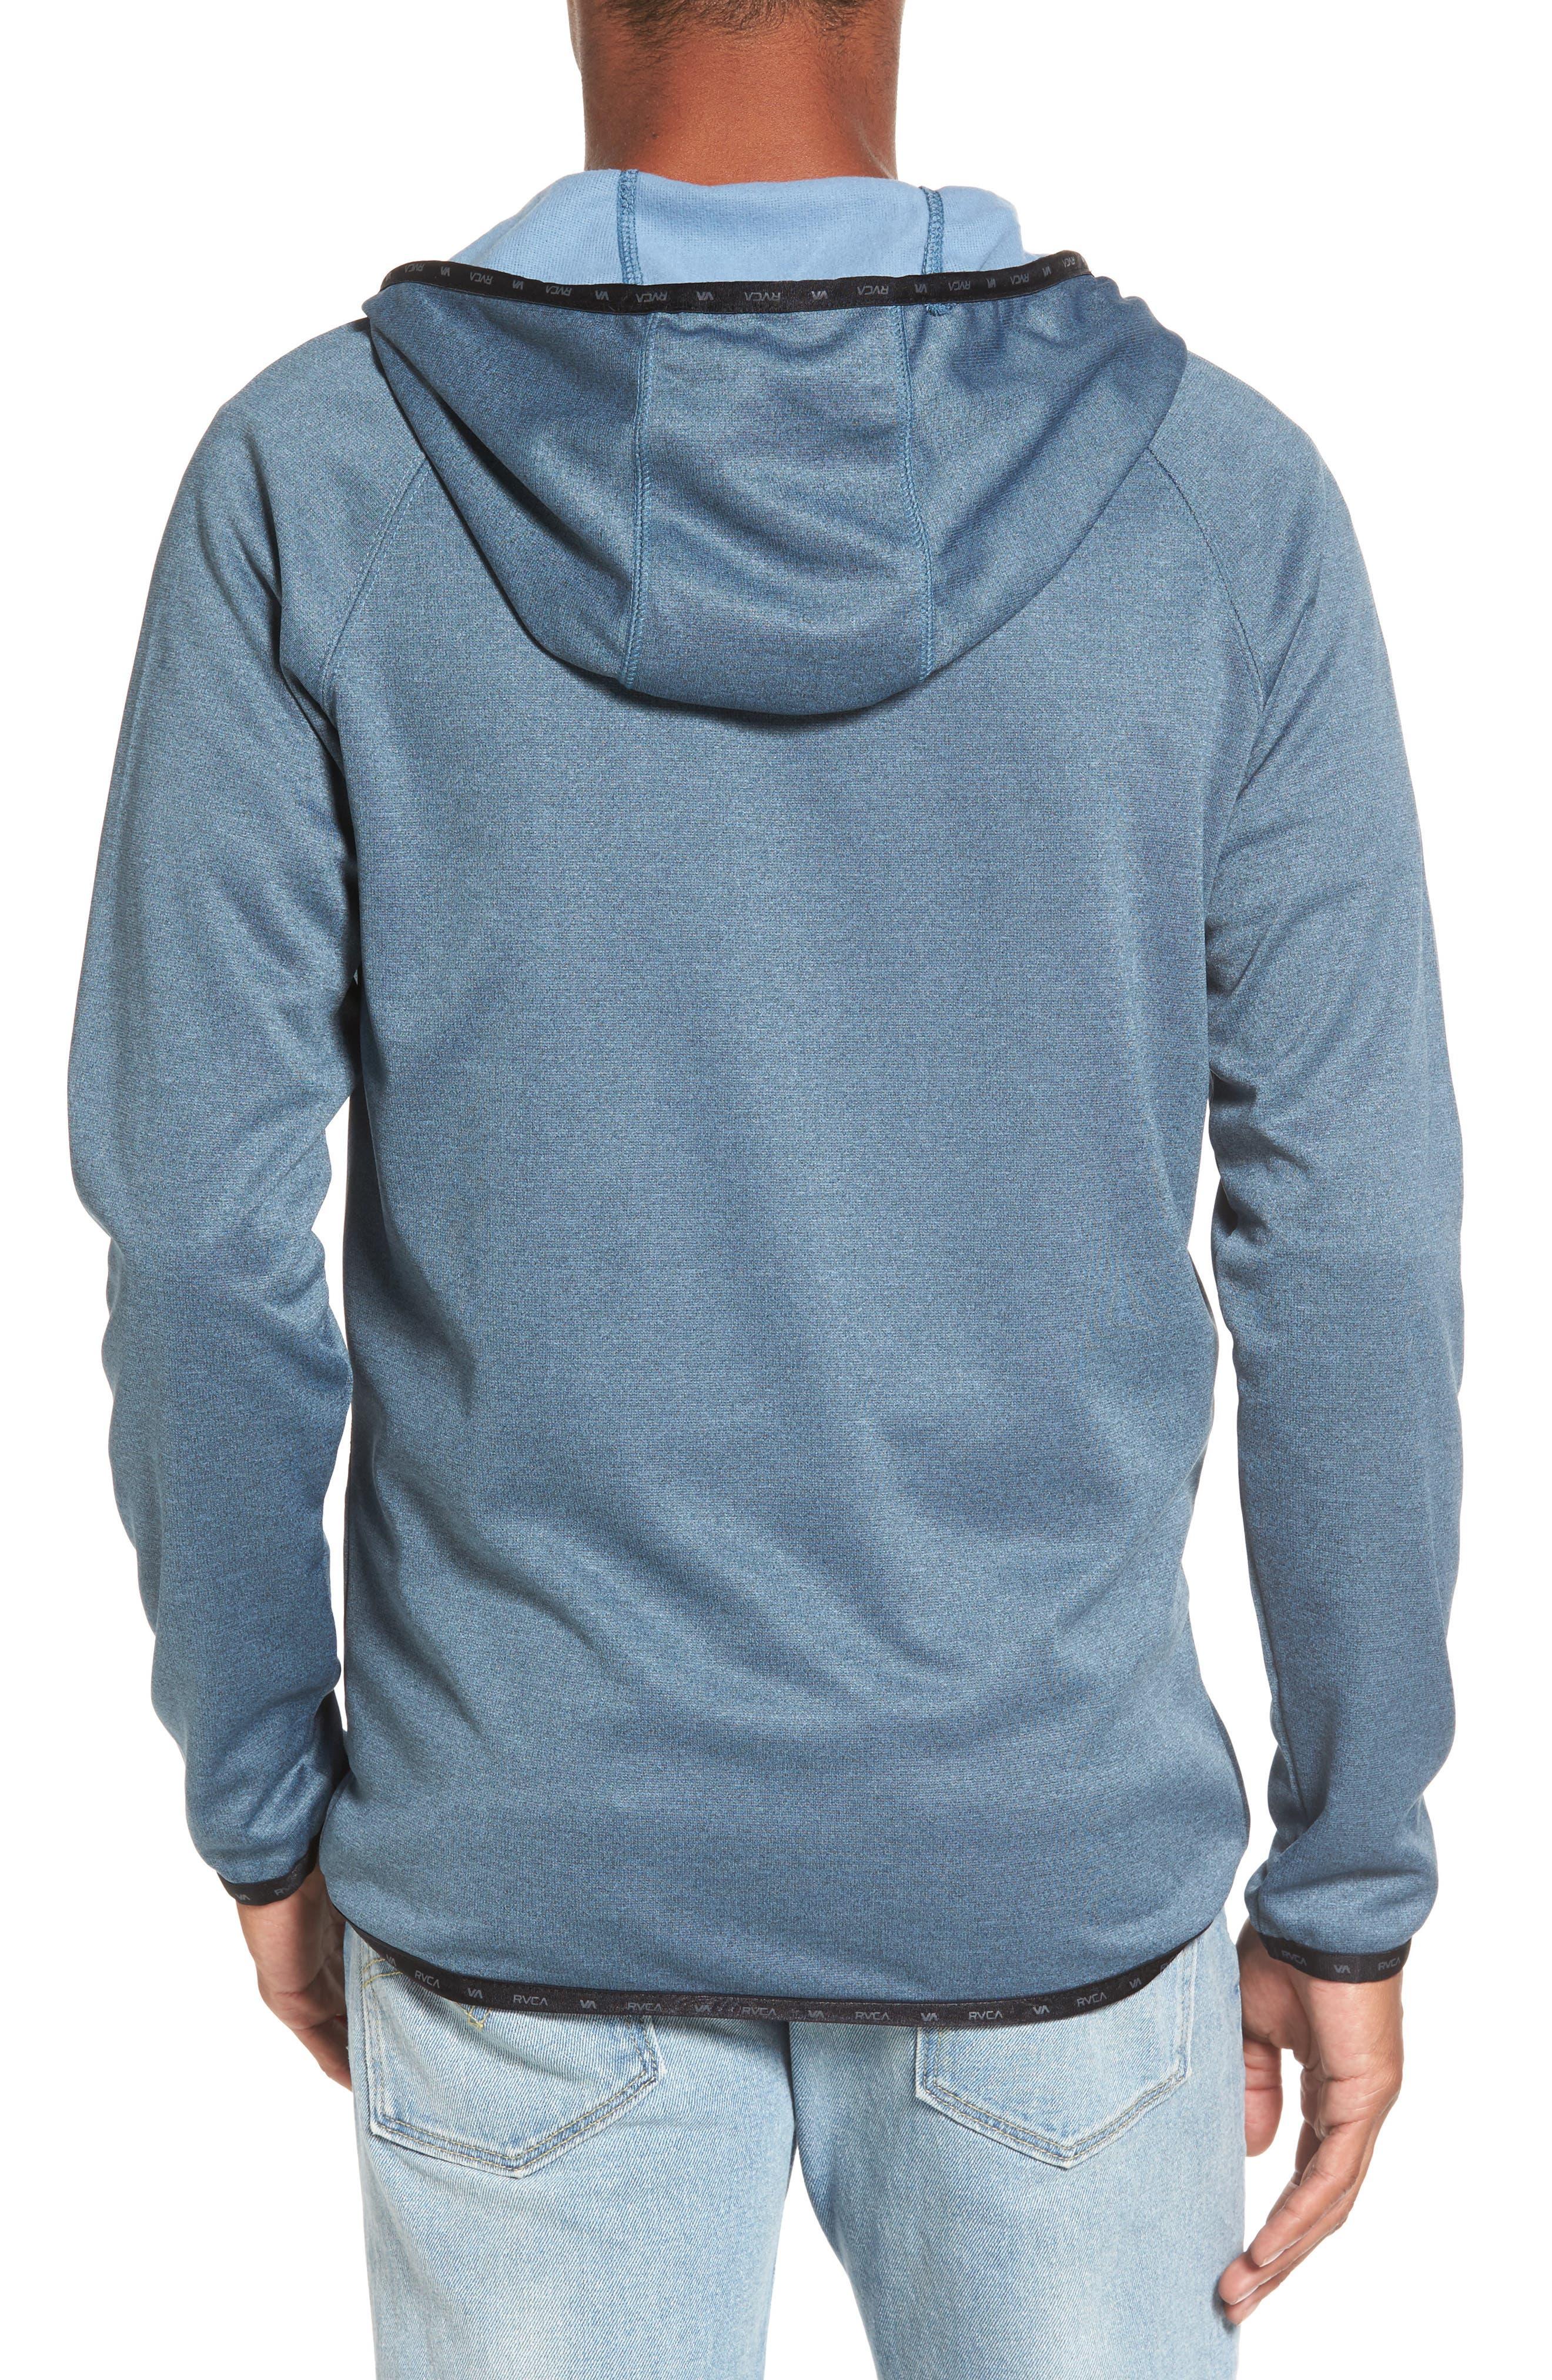 Shermin Zip Hoodie,                             Alternate thumbnail 2, color,                             Desert Blue